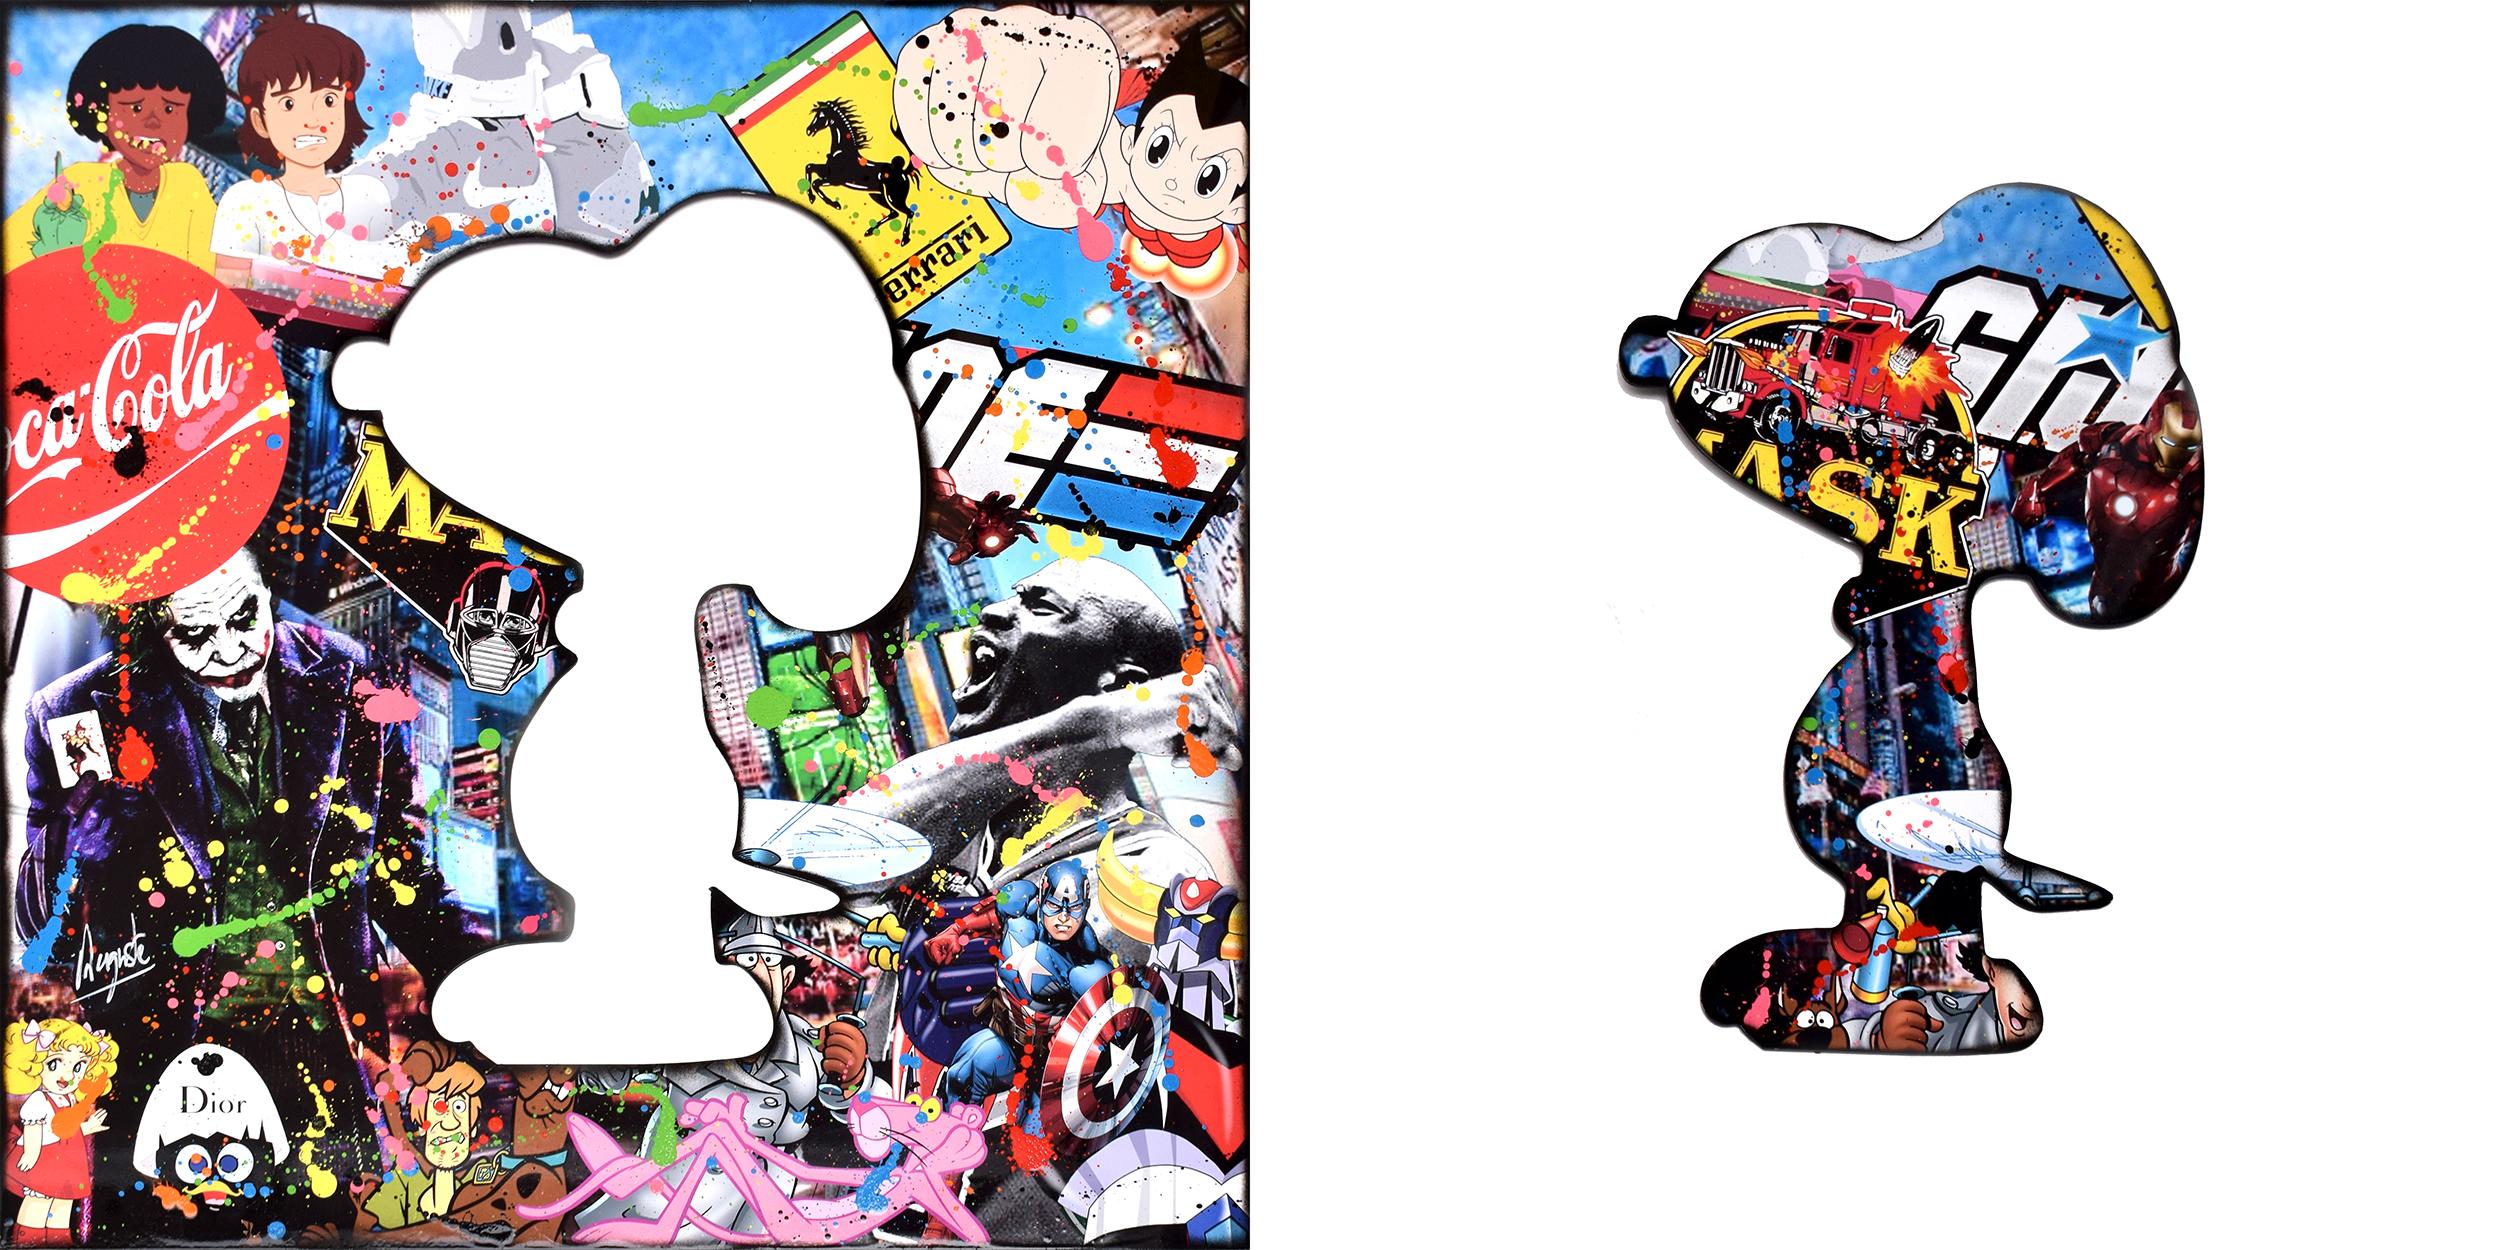 Auguste - Snoopy is Pop , 9884-012-040